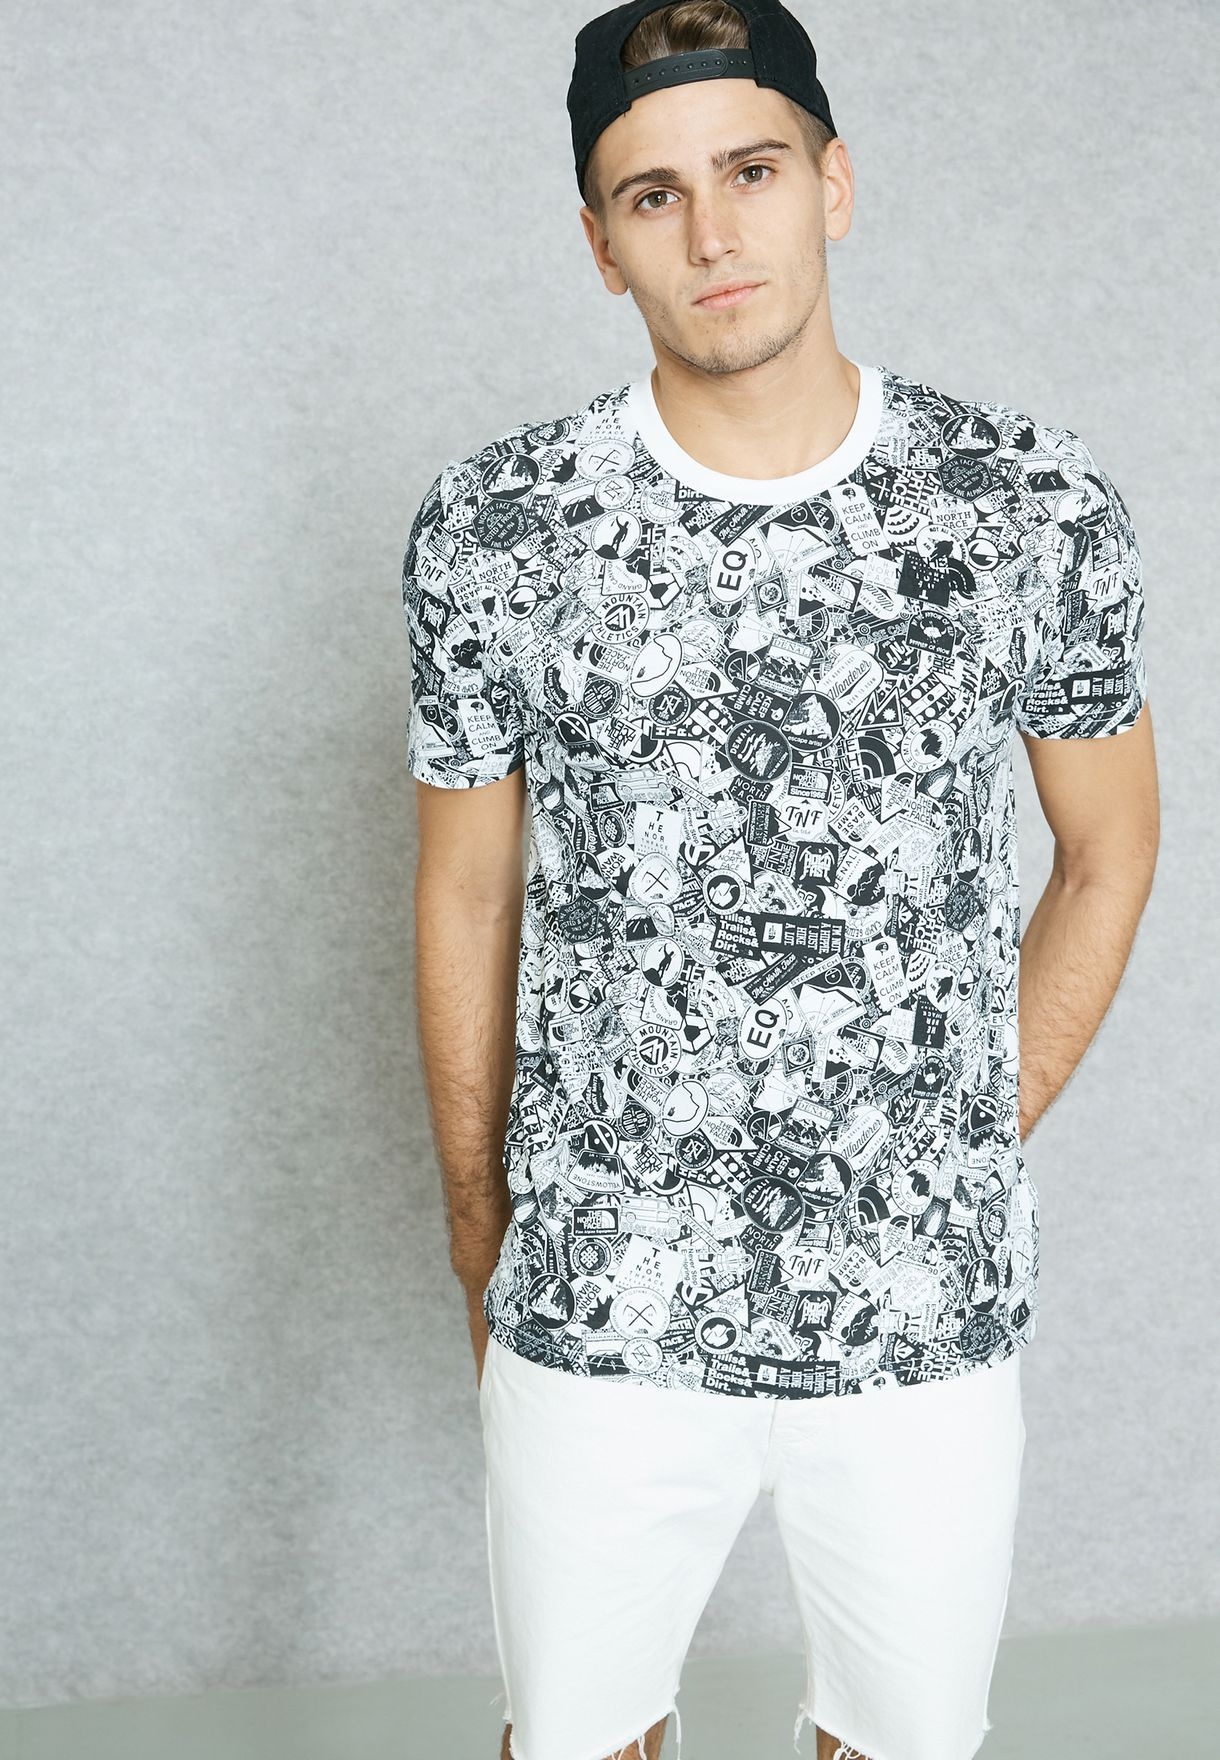 cfcc0ac3 Shop The North Face monochrome Simple Dome T-Shirt NOT92TX5-QUN for ...